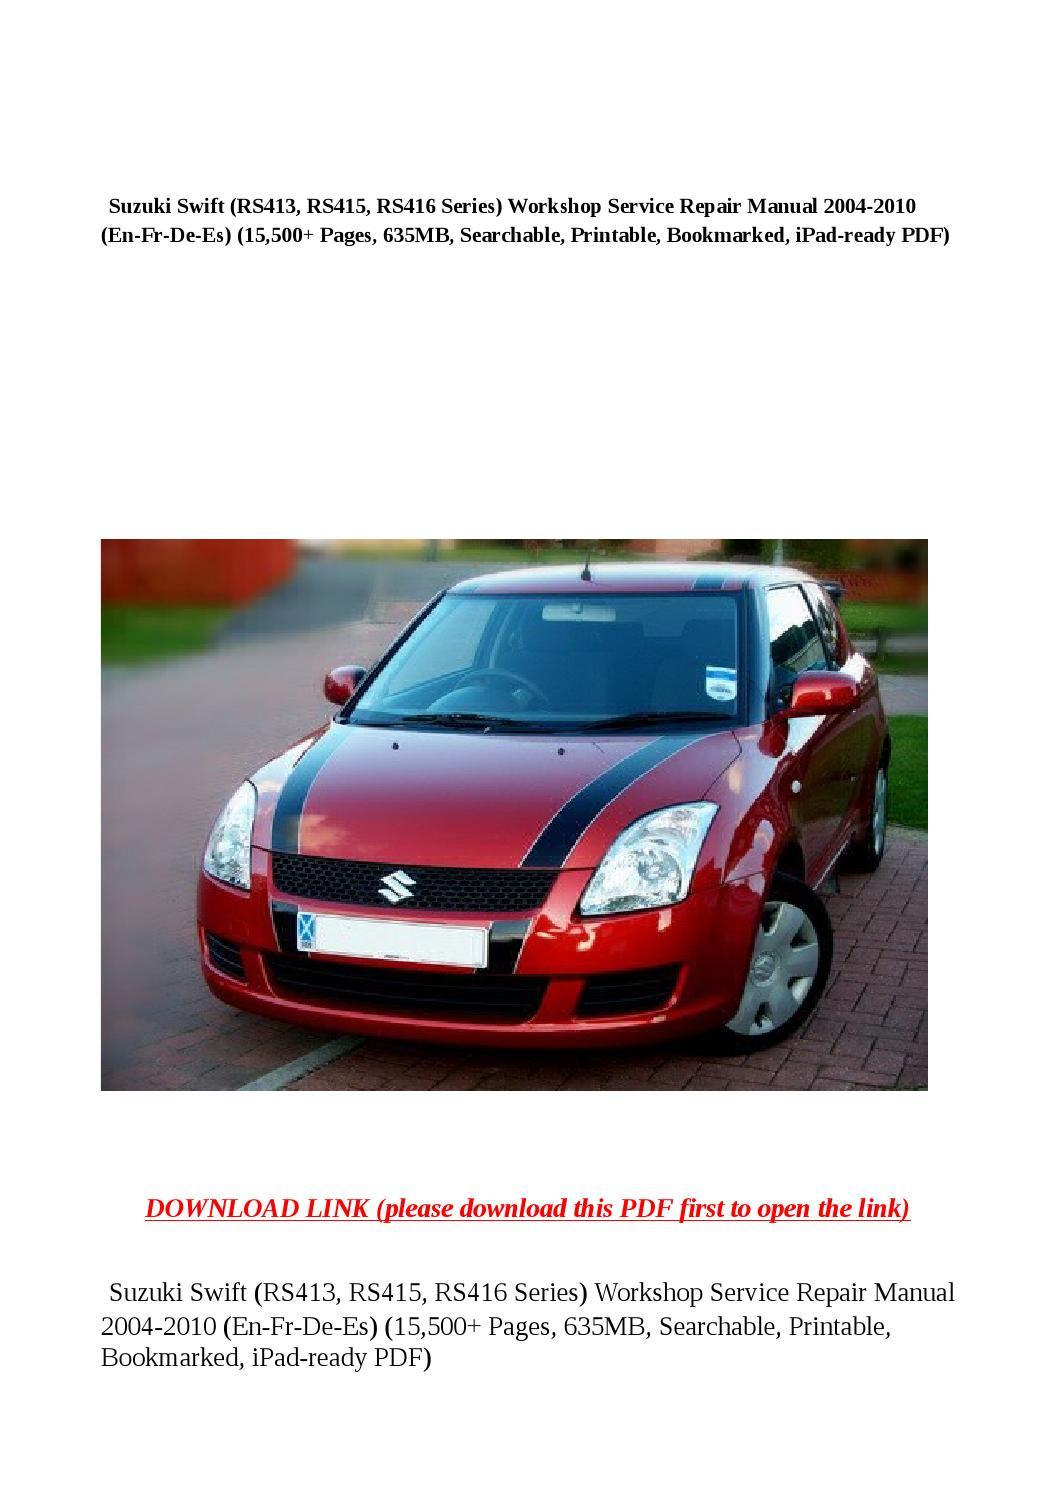 2010 suzuki swift re4 manual